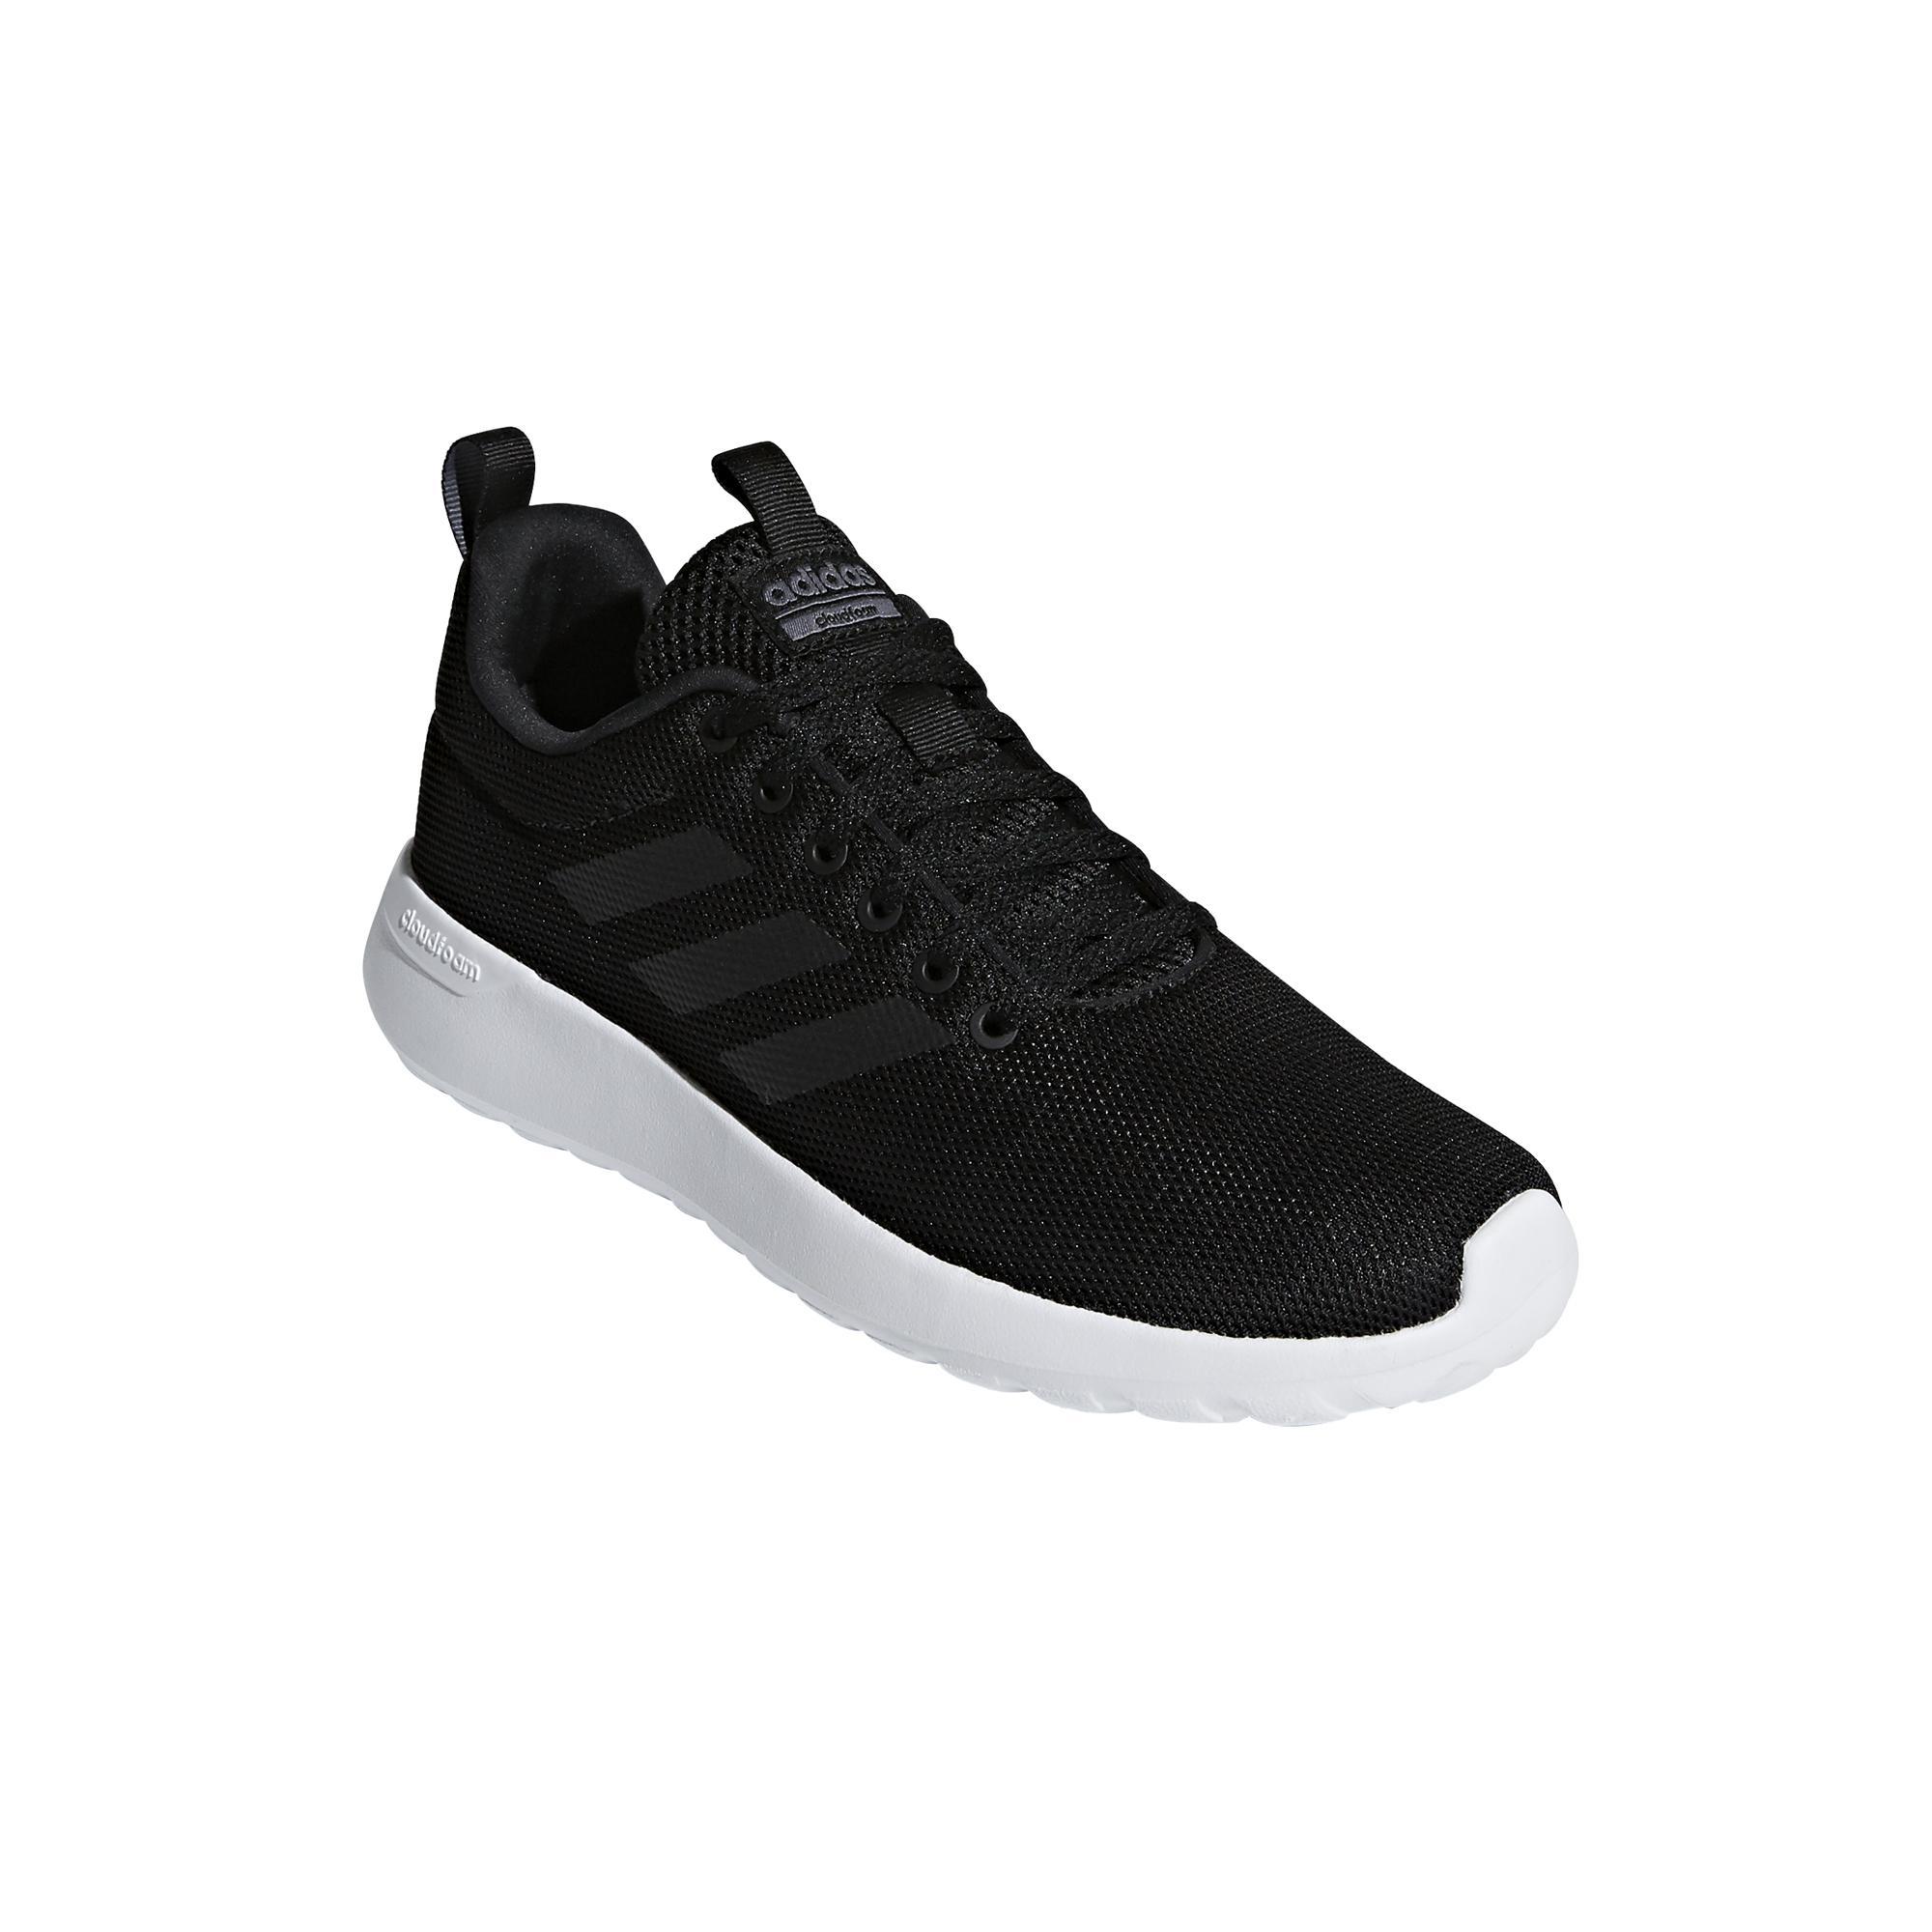 99ce0fab2 ... best price singapore. adidas lite racer cln womens running shoes bb6896  ad47d d7957